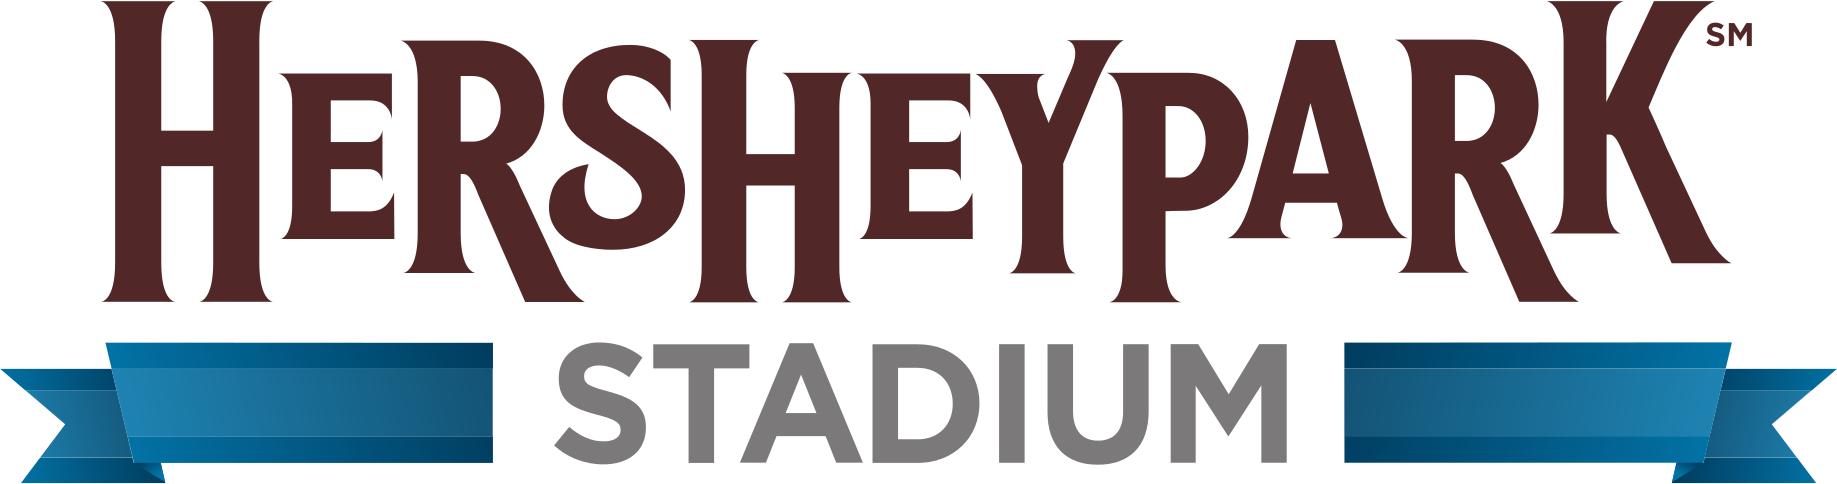 Hersheypark Stadium Logopedia Fandom Powered By Wikia